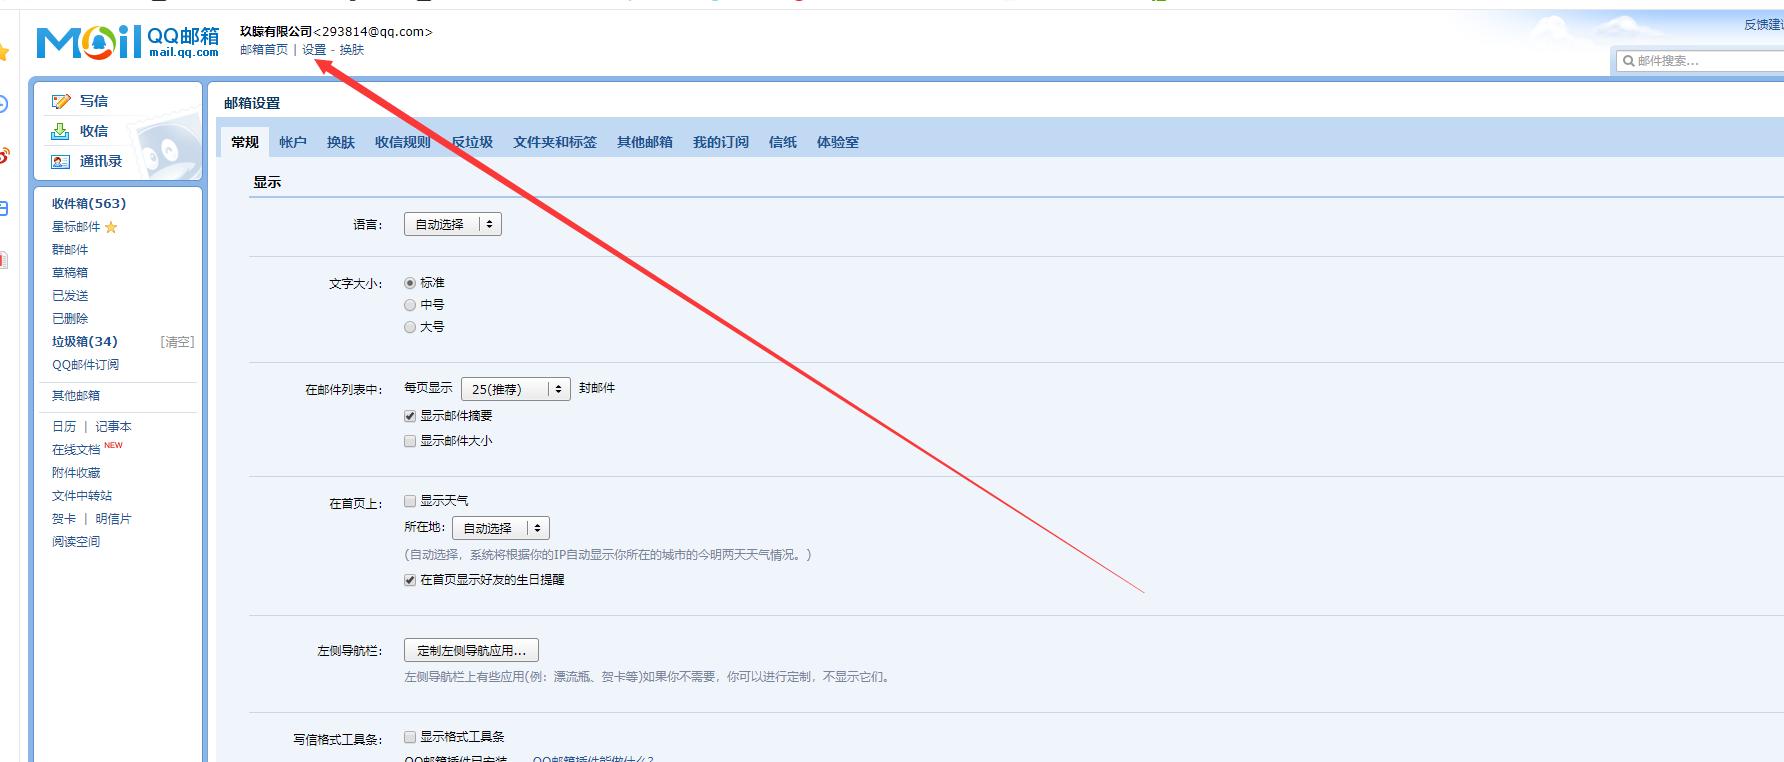 <span style='color:#c73272'>彩虹代刷、易支付、个人发卡邮箱配置问题</span>